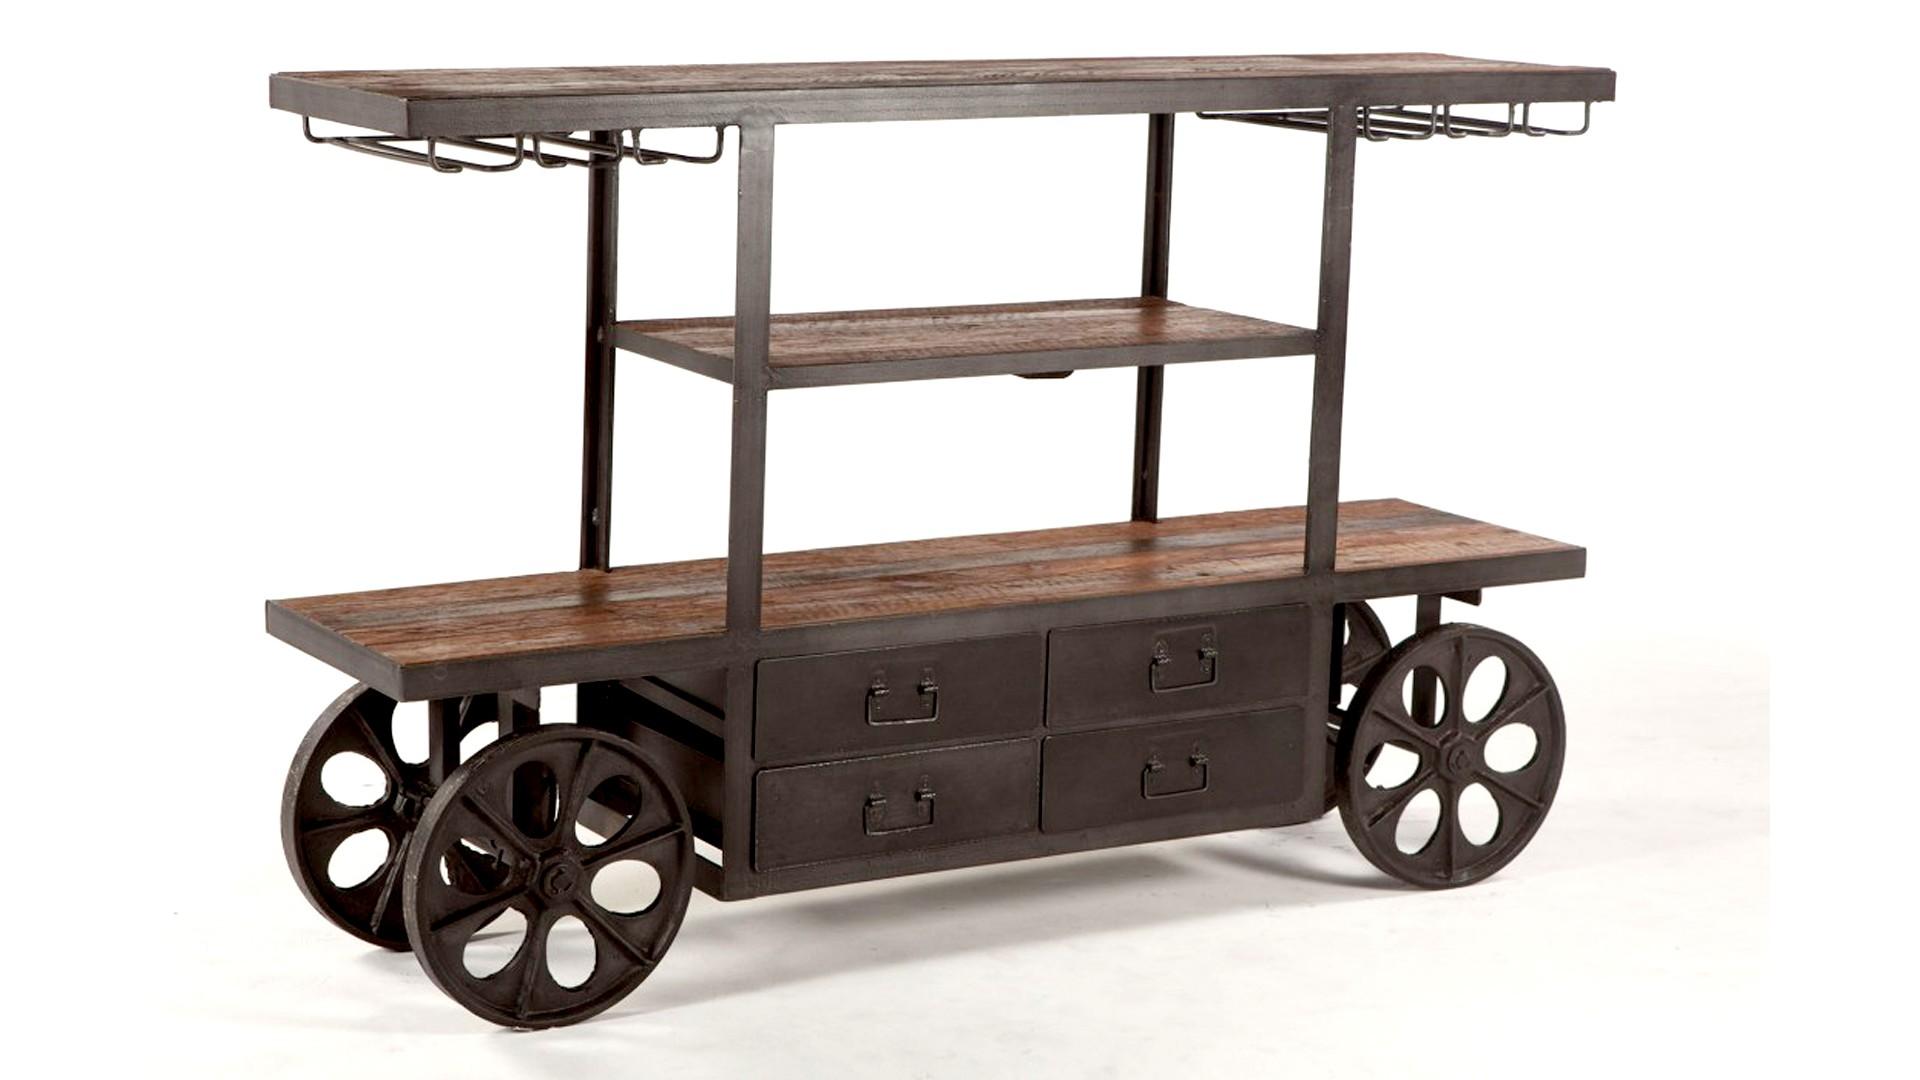 Industrial Teak Bar Cart Table 66 inch